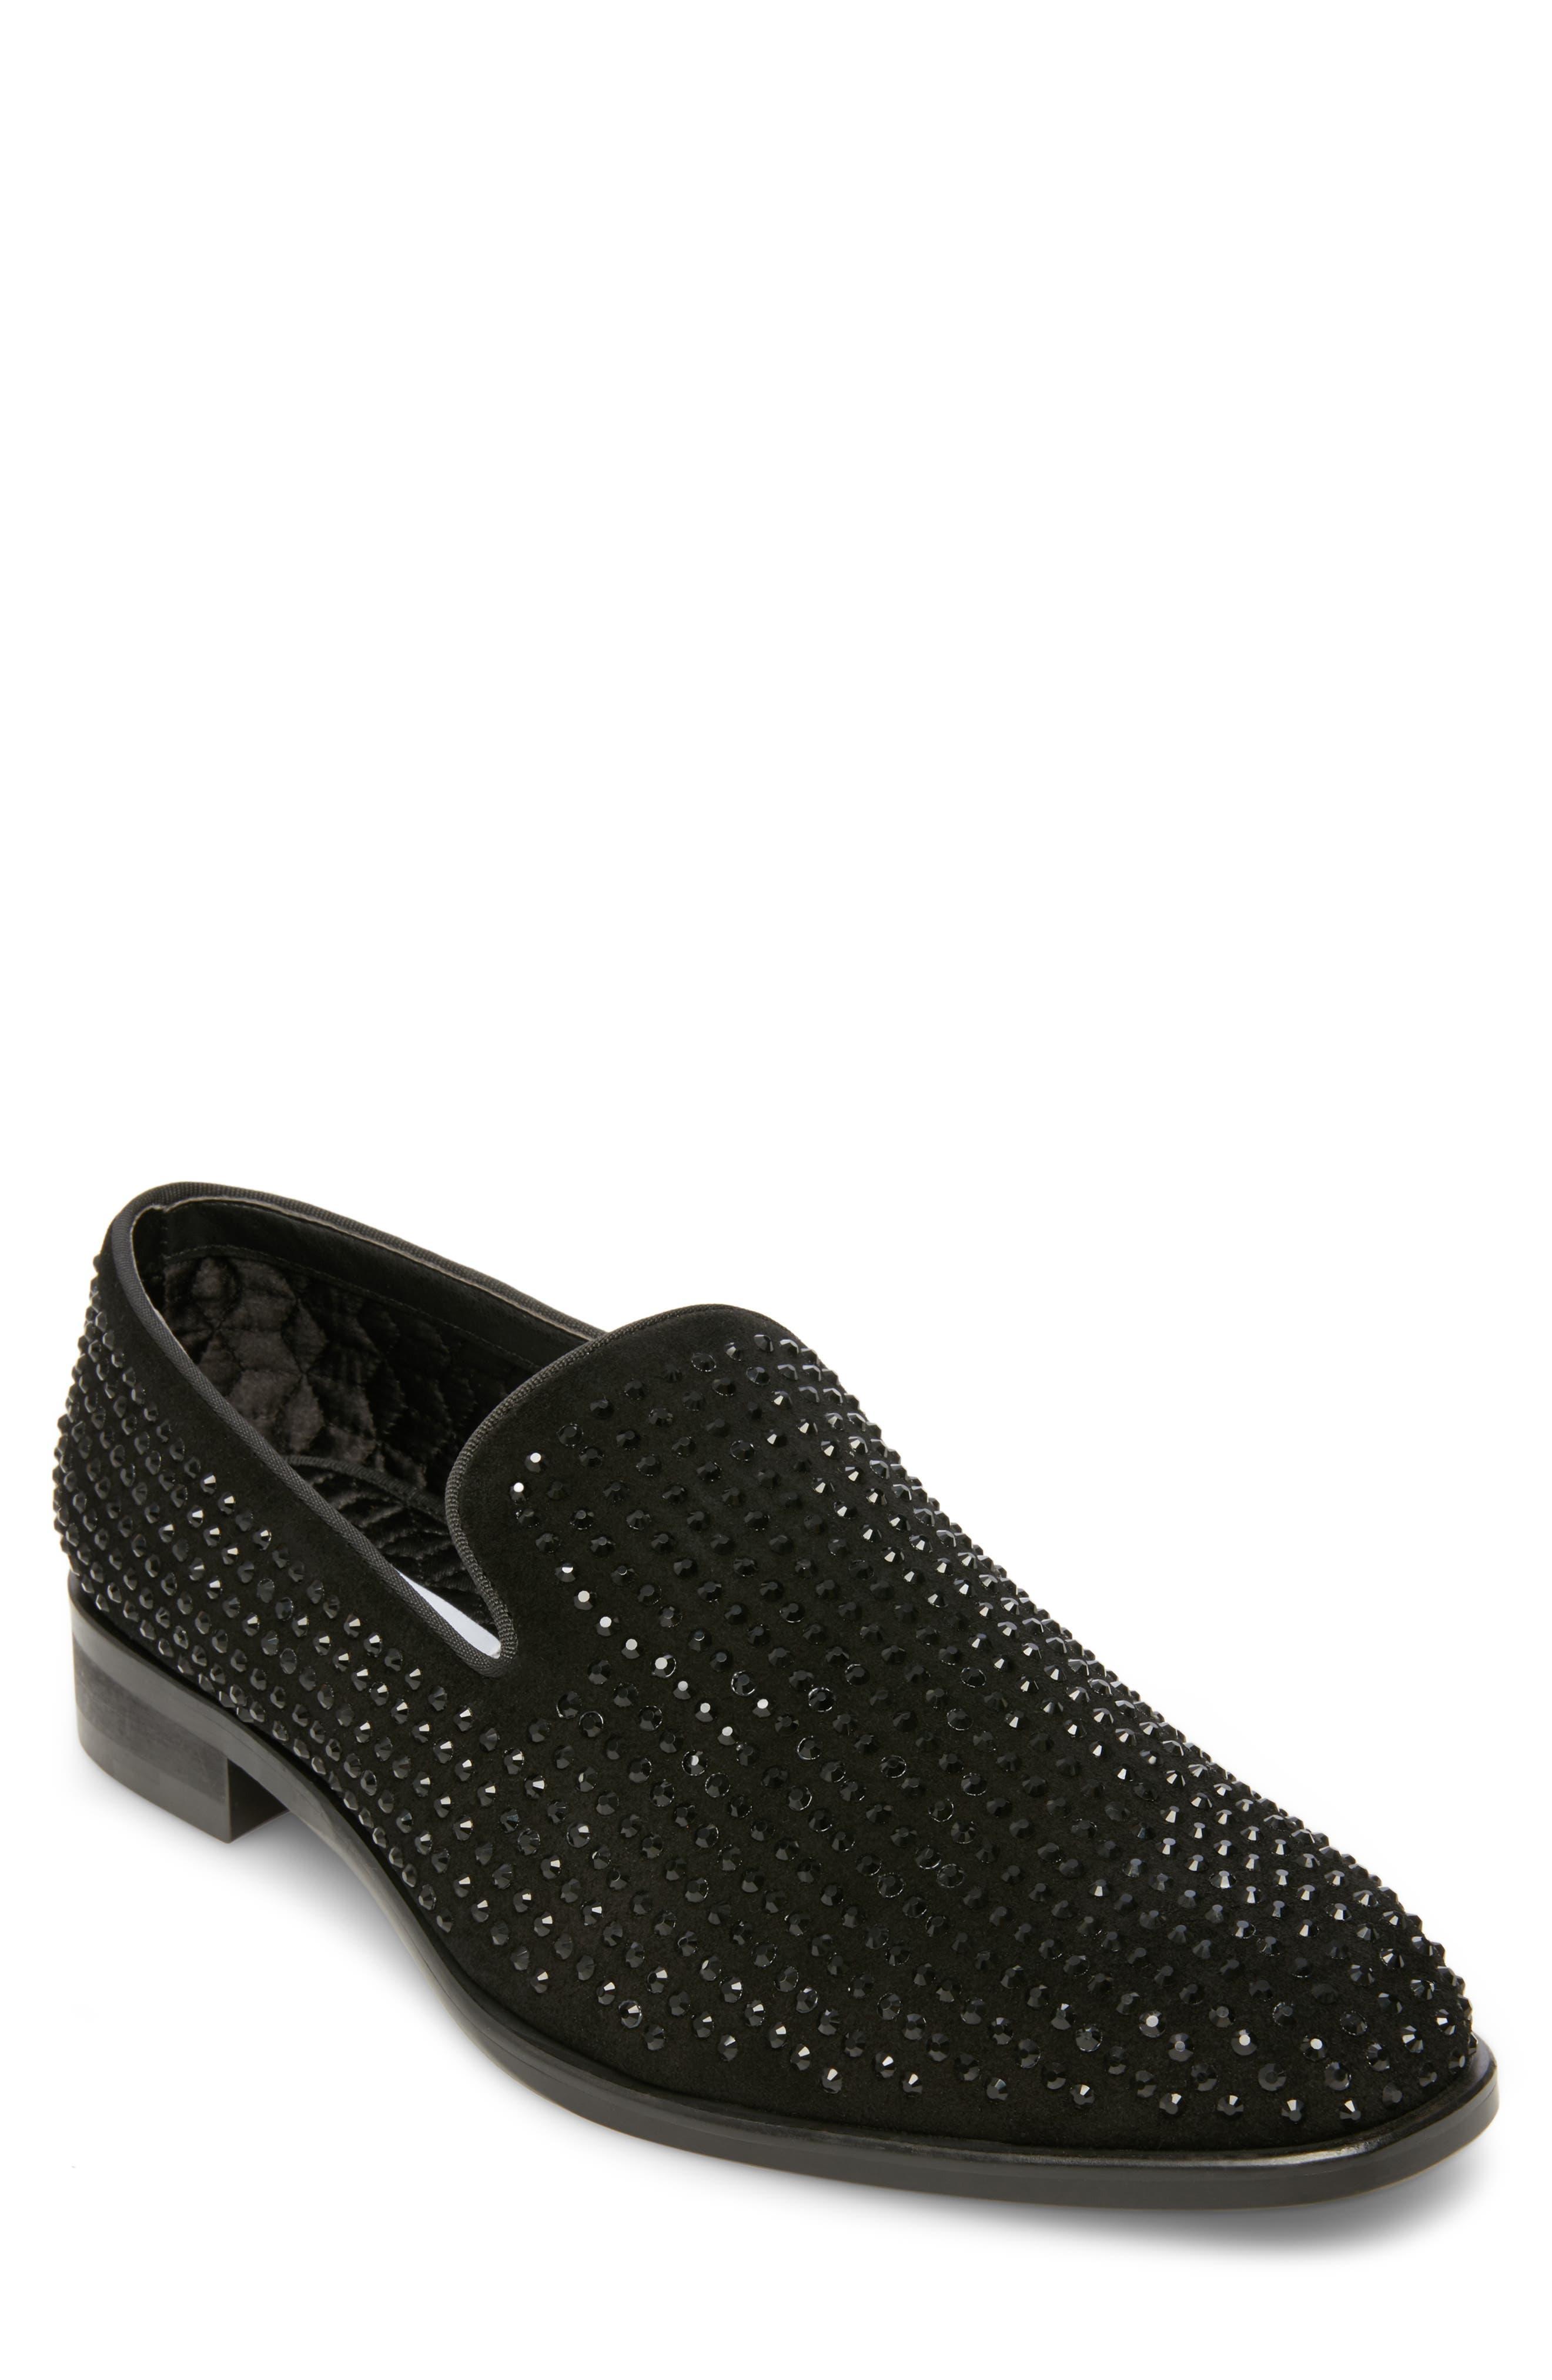 Falsetto Studded Venetian Loafer,                             Main thumbnail 1, color,                             BLACK